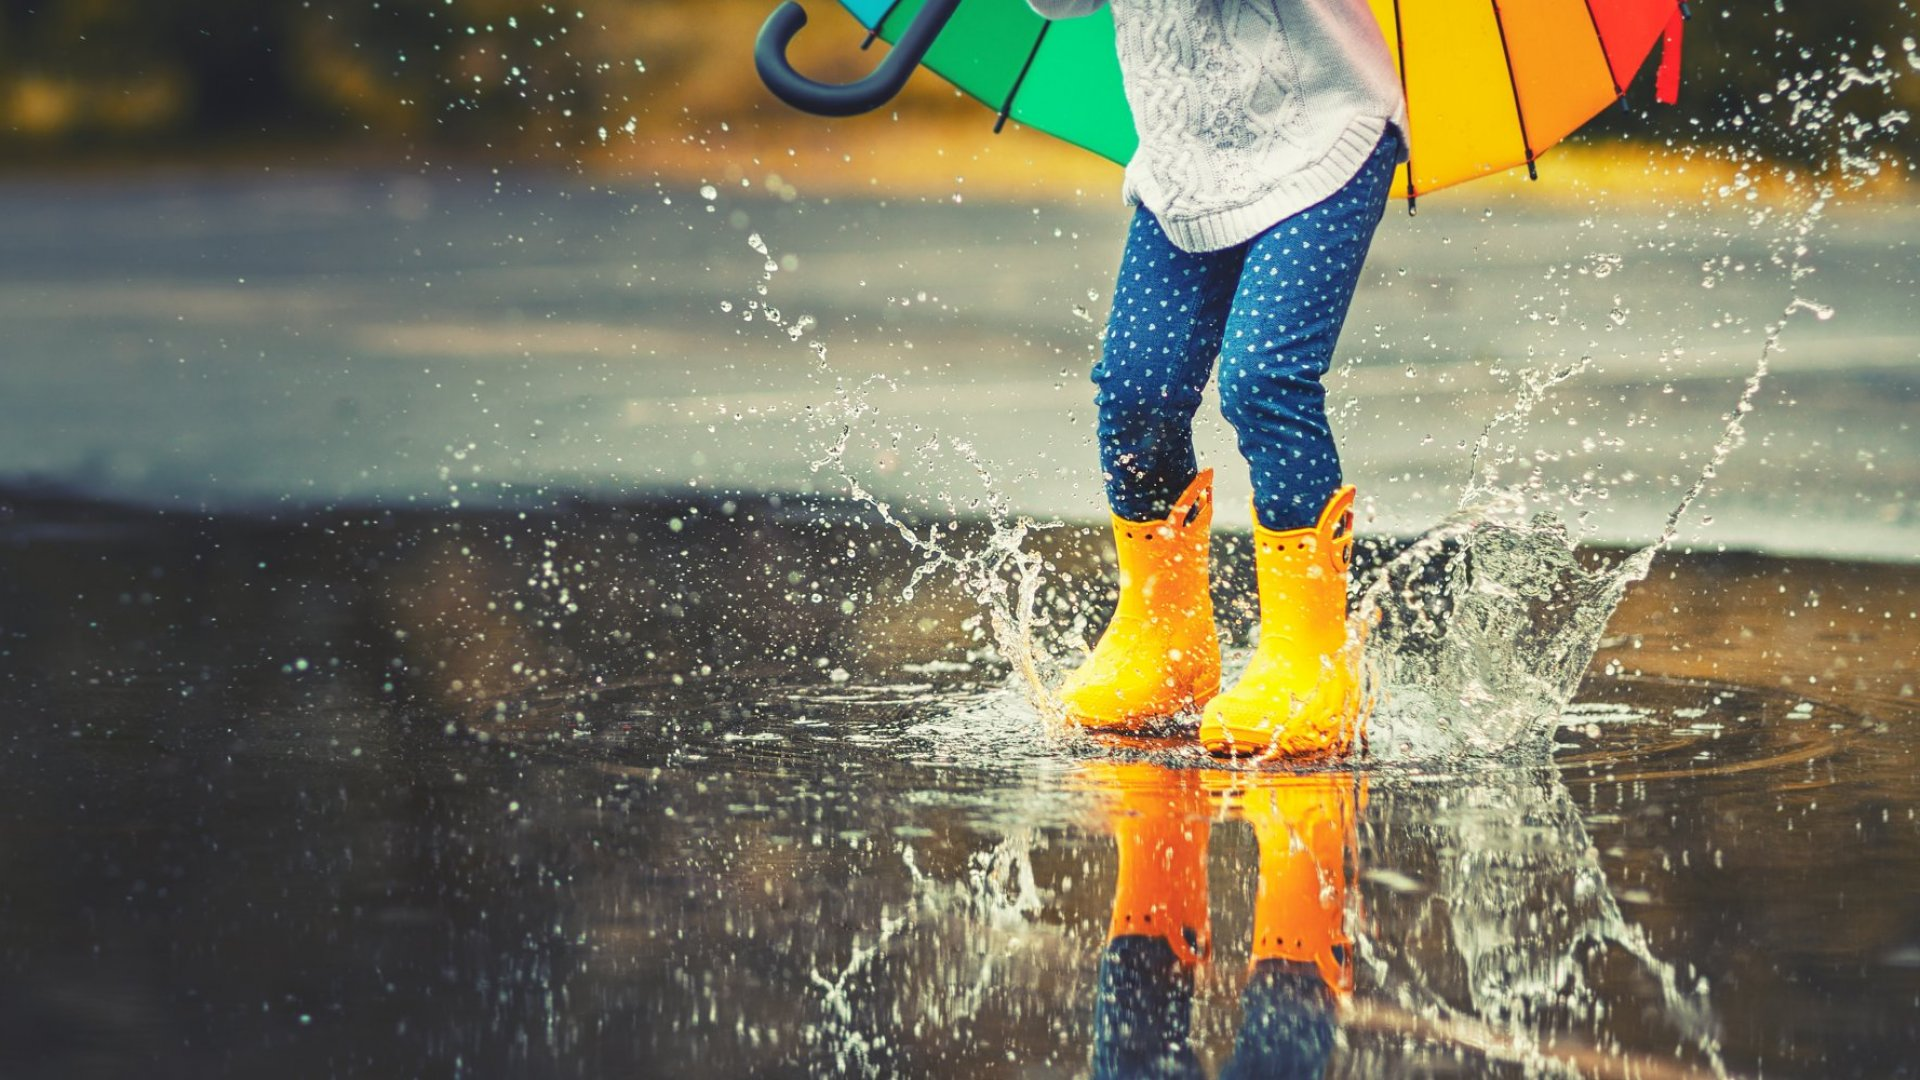 rainy messages